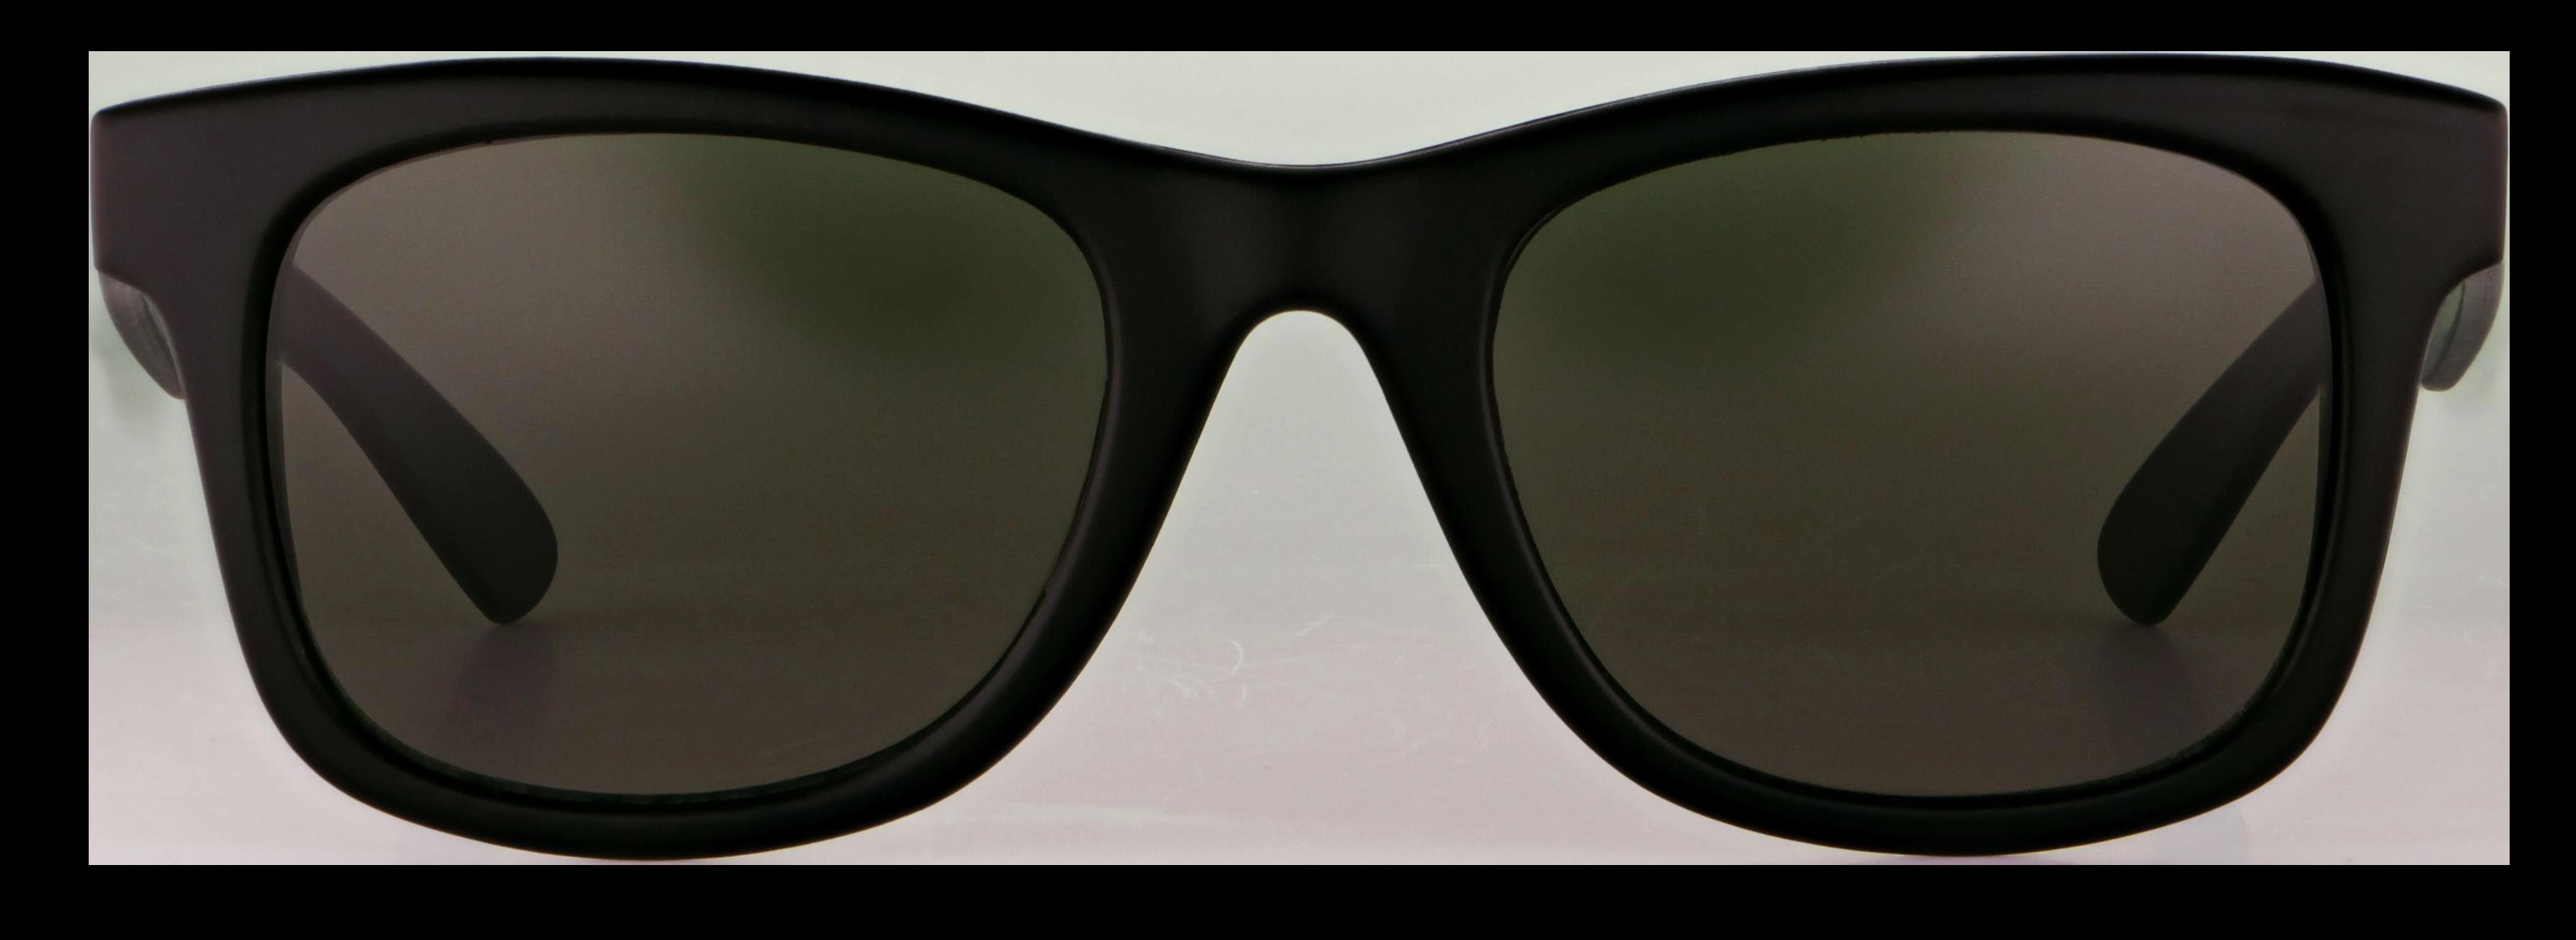 abele optik Kindersonnenbrille 718811